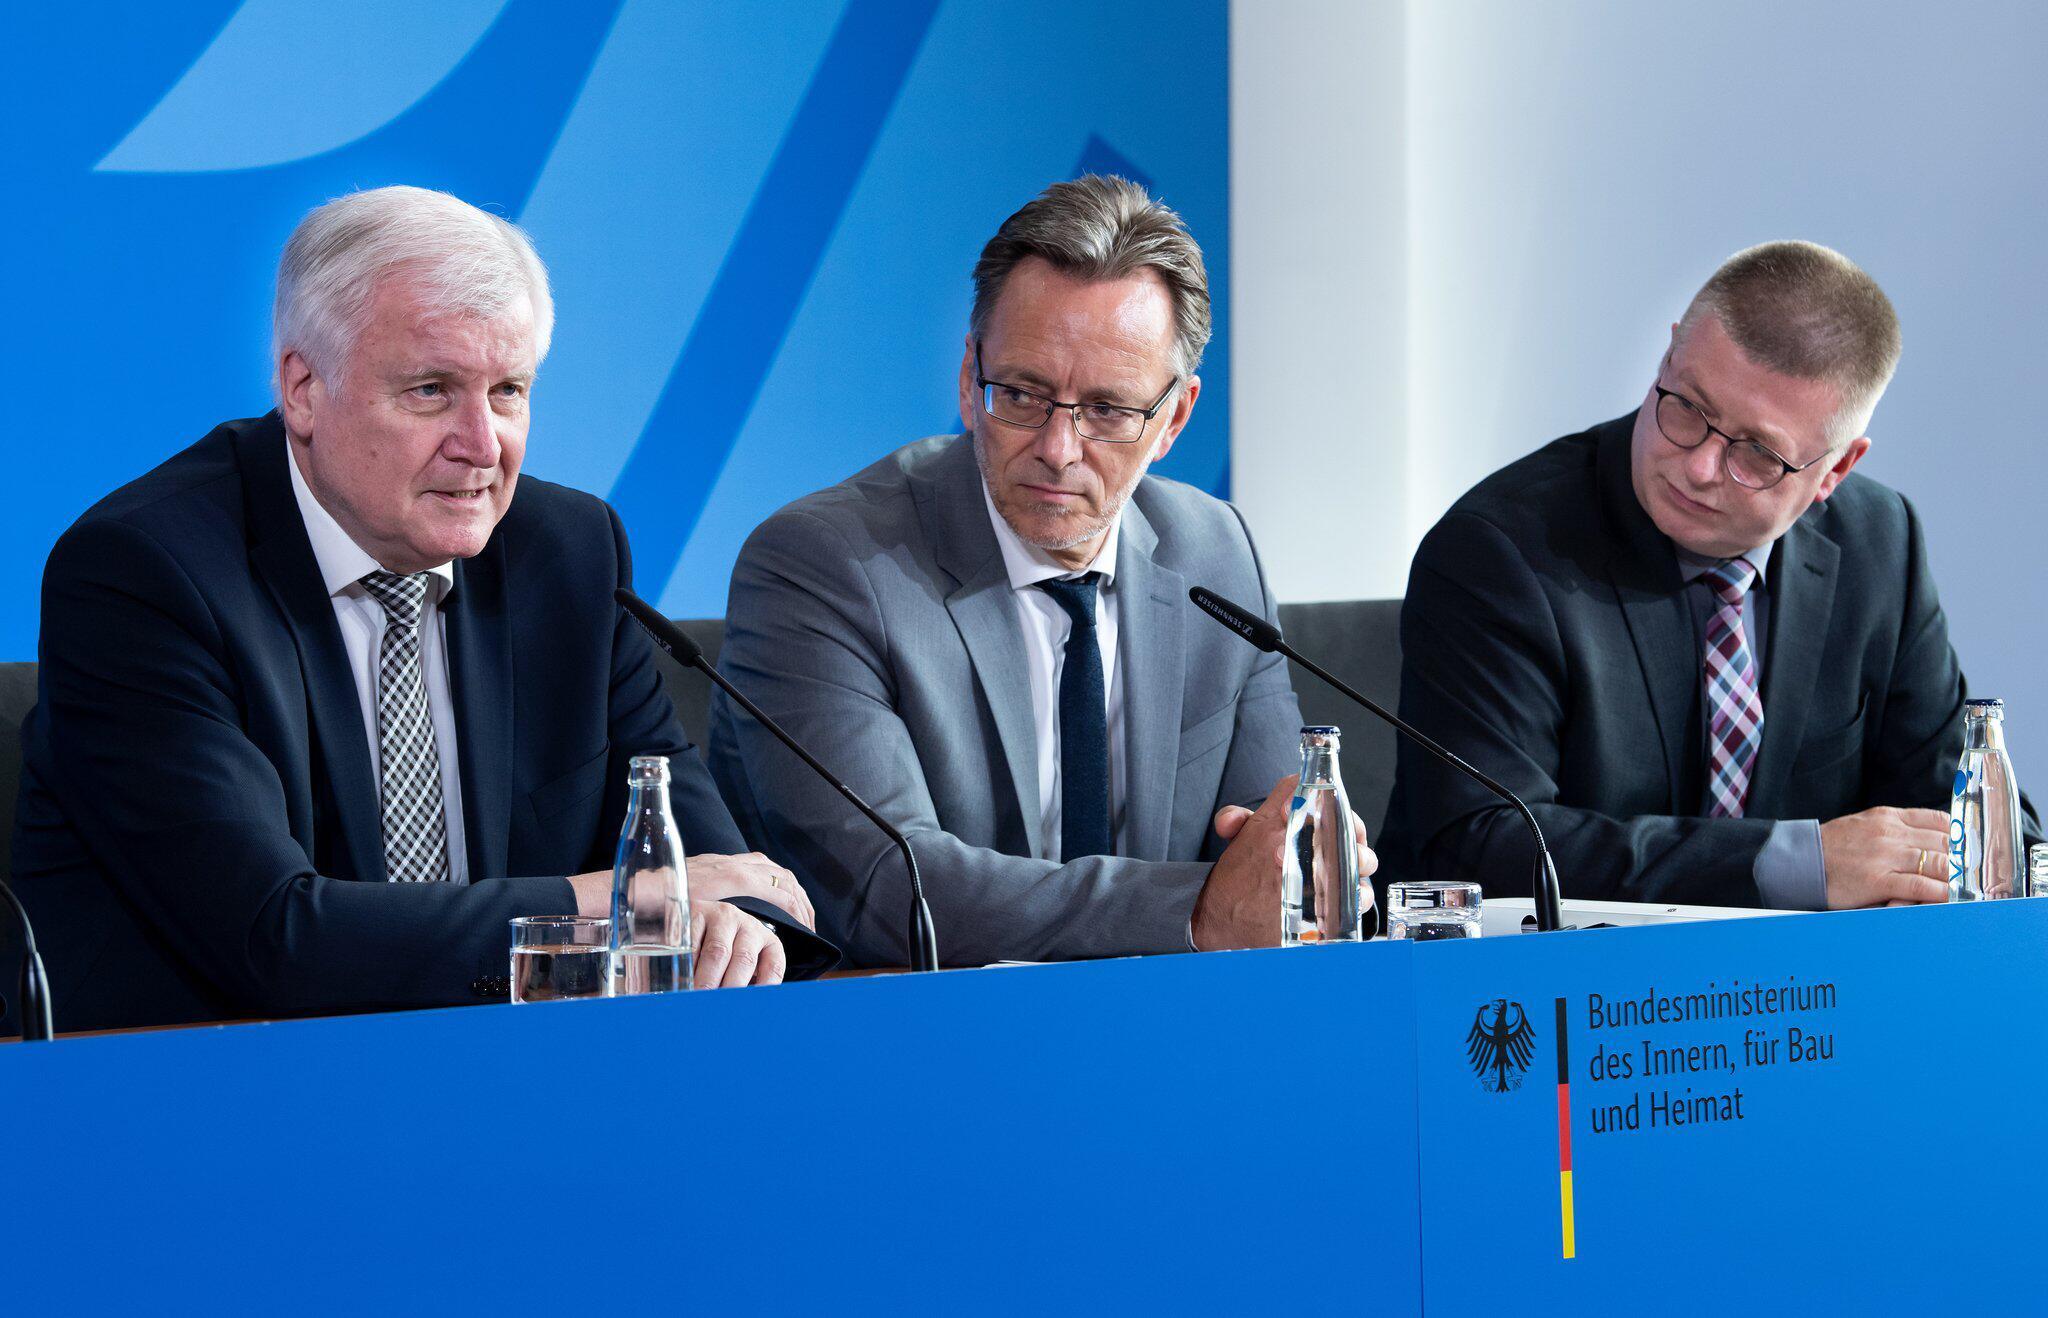 Bild zu Presse Konferenz, Seehofer, Innenminister, Lübcke